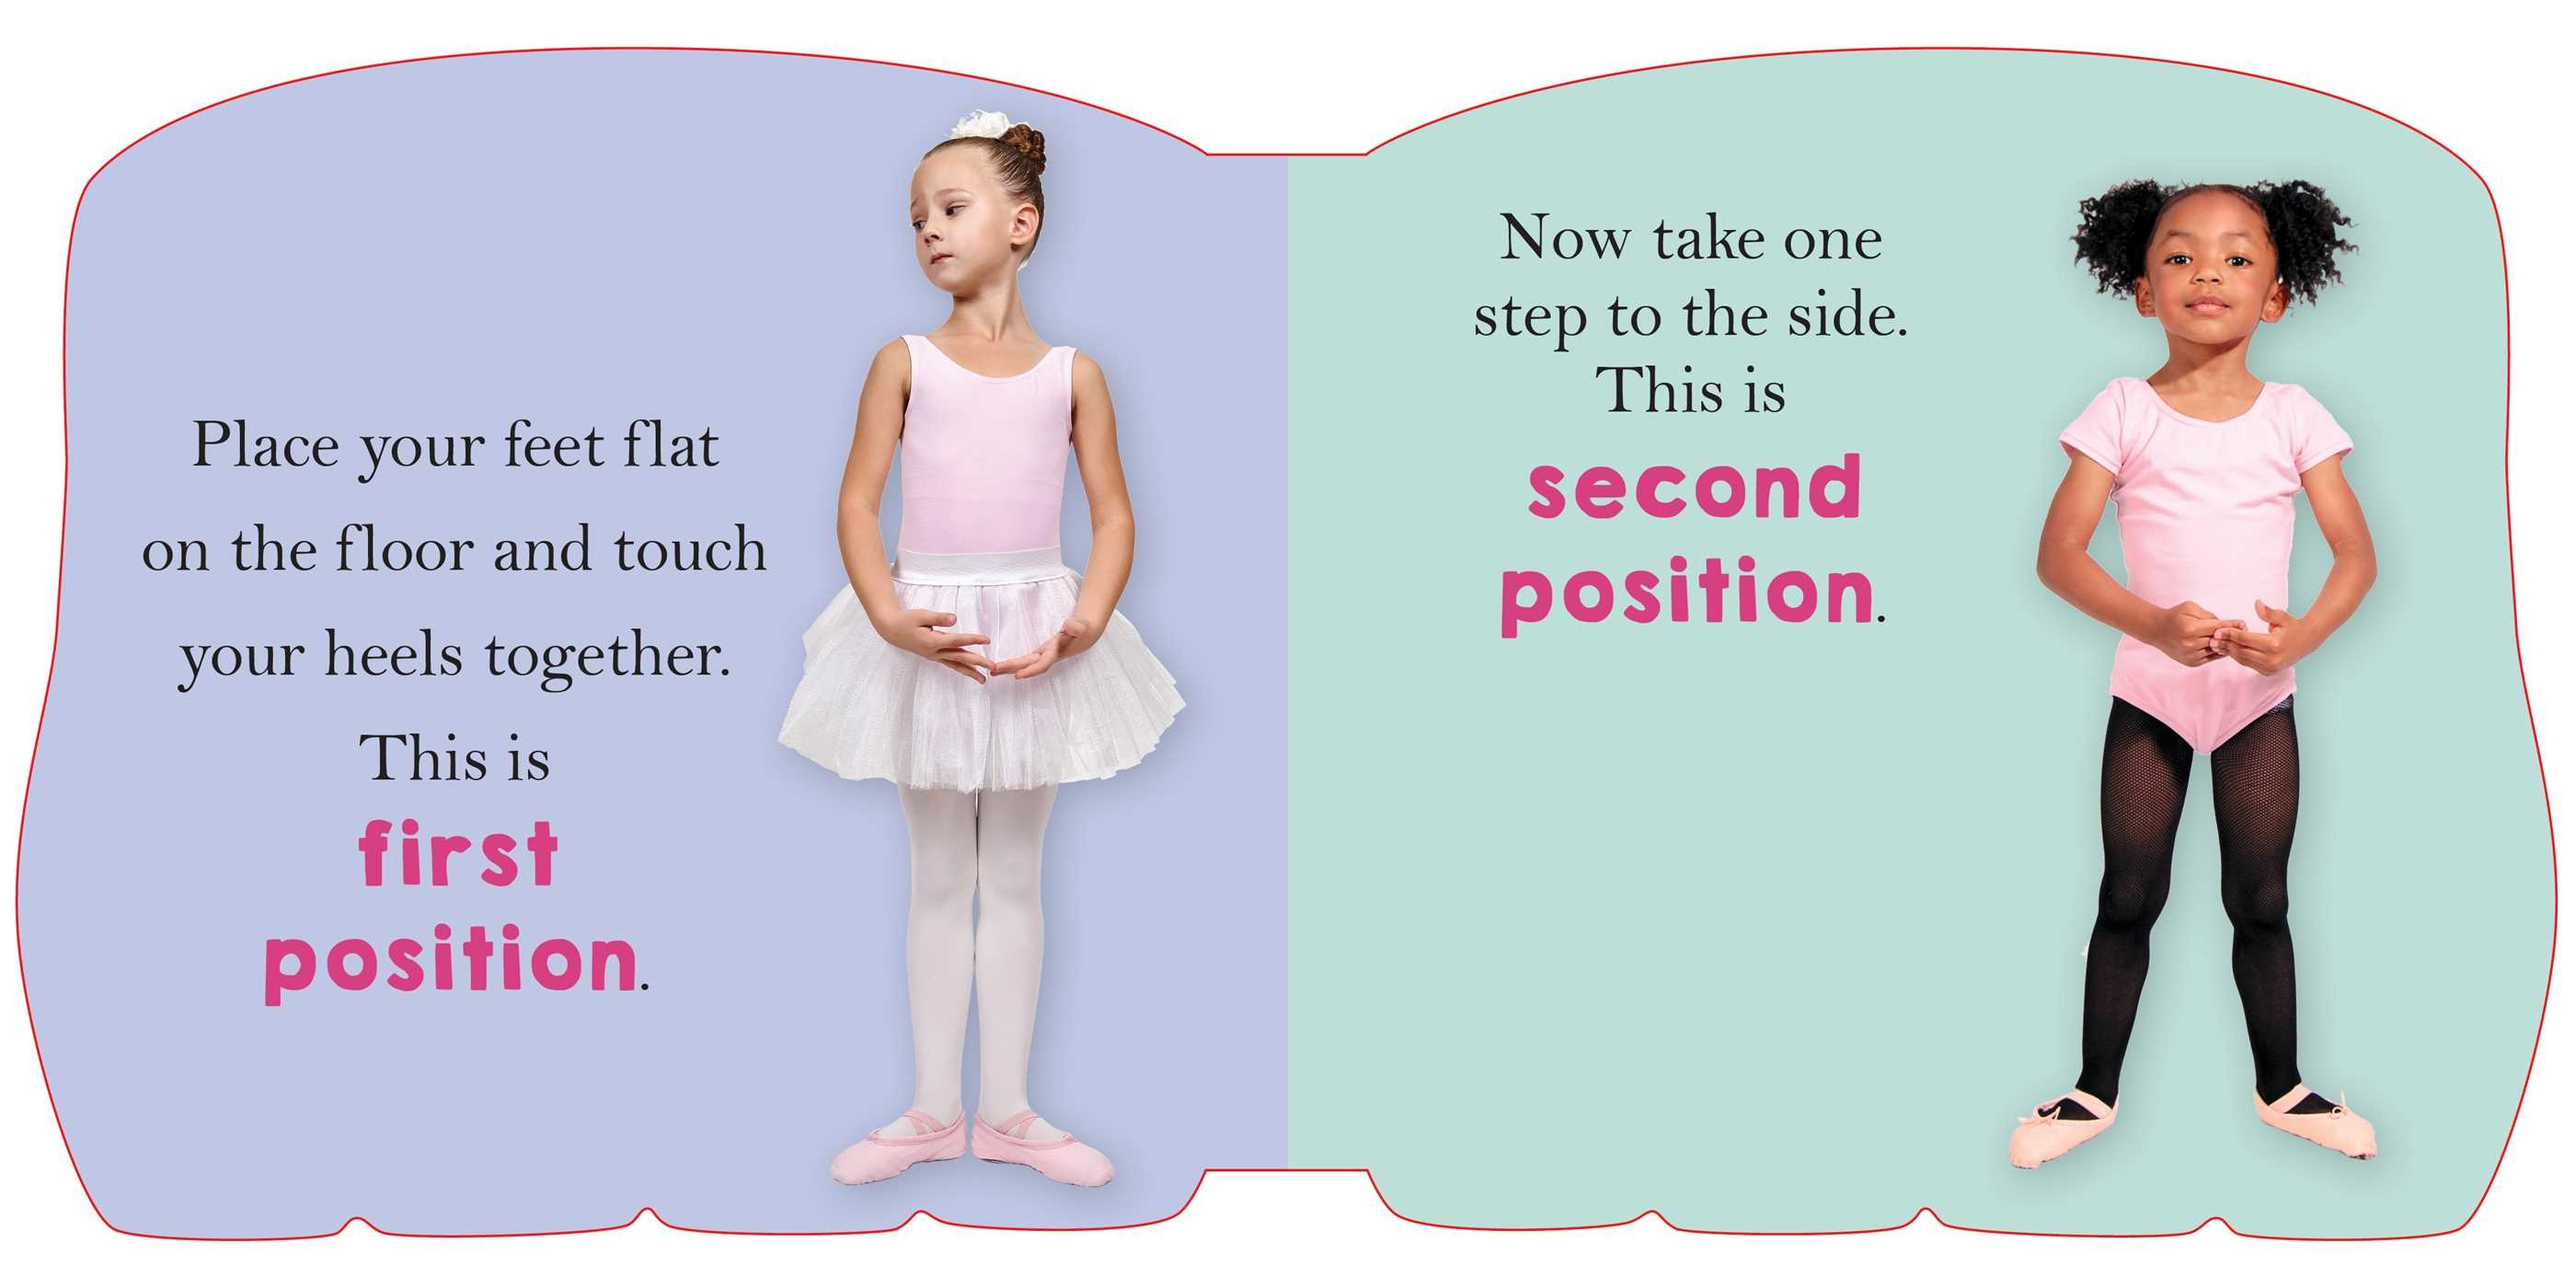 Ballet slippers 9781534422162.in01